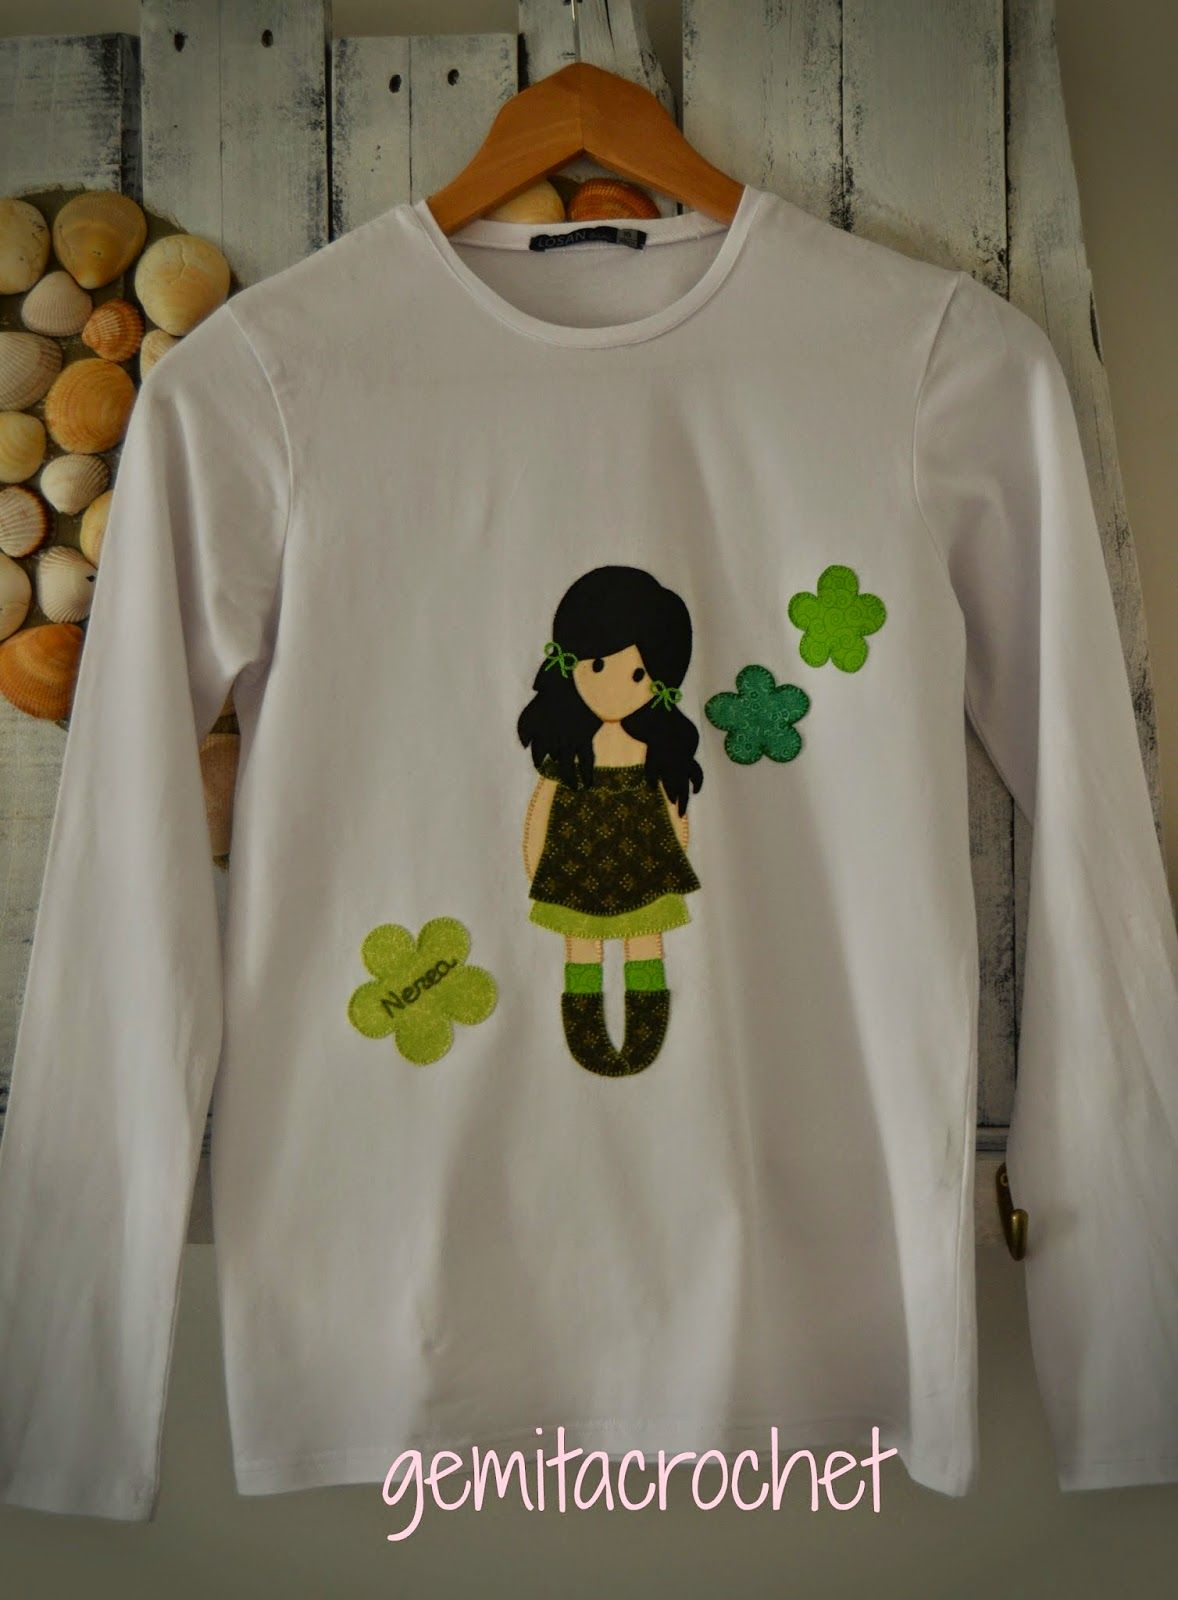 GEMITA CROCHET : Camiseta personalizada estilo Gorjuss | T\'shirts ...